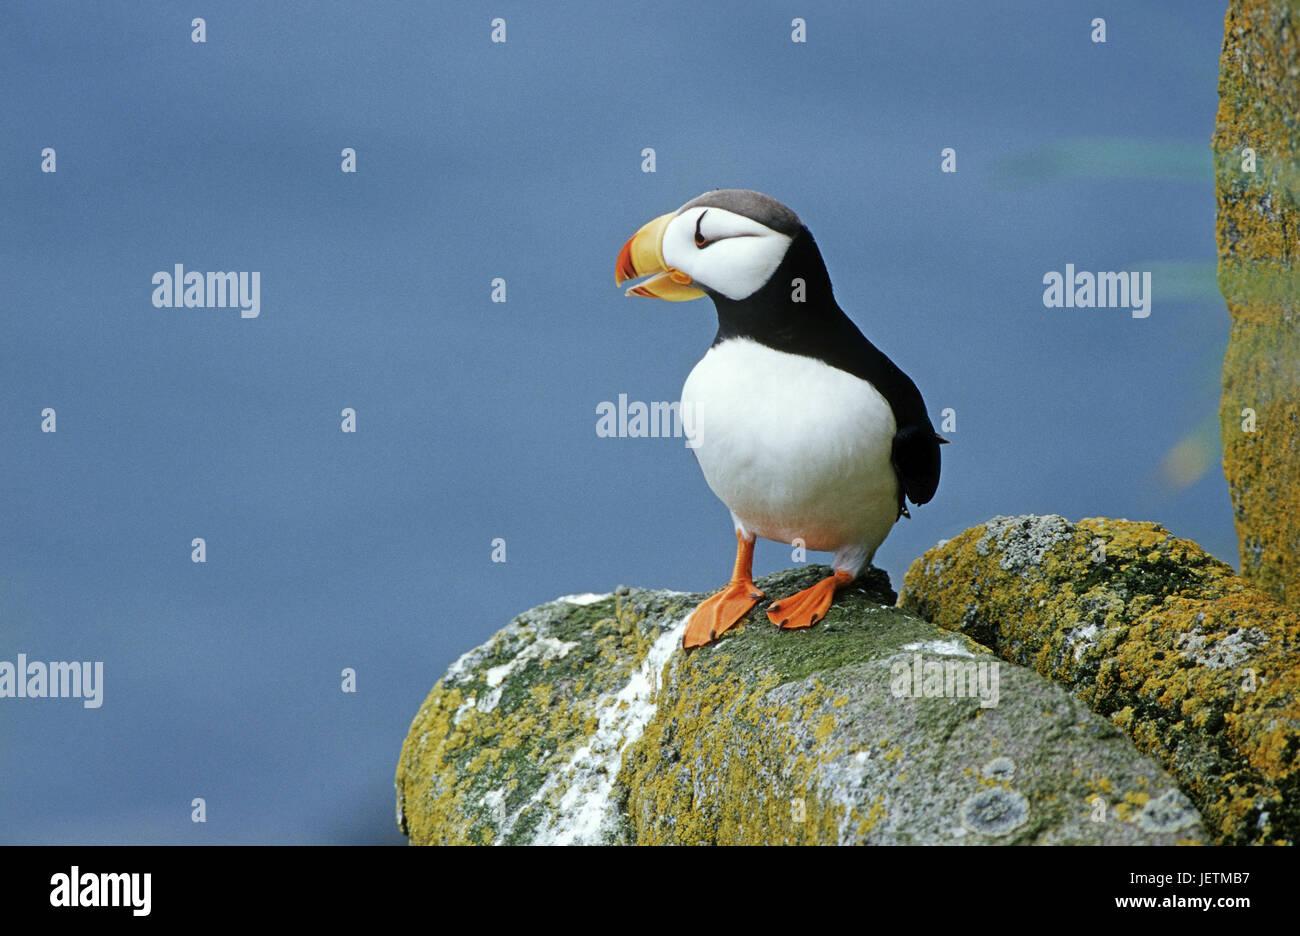 Parrot diver, Fratercula corniculata, Round Iceland, the Bering Sea, Alaska, Papageientaucher (Fratercula corniculata), Stock Photo